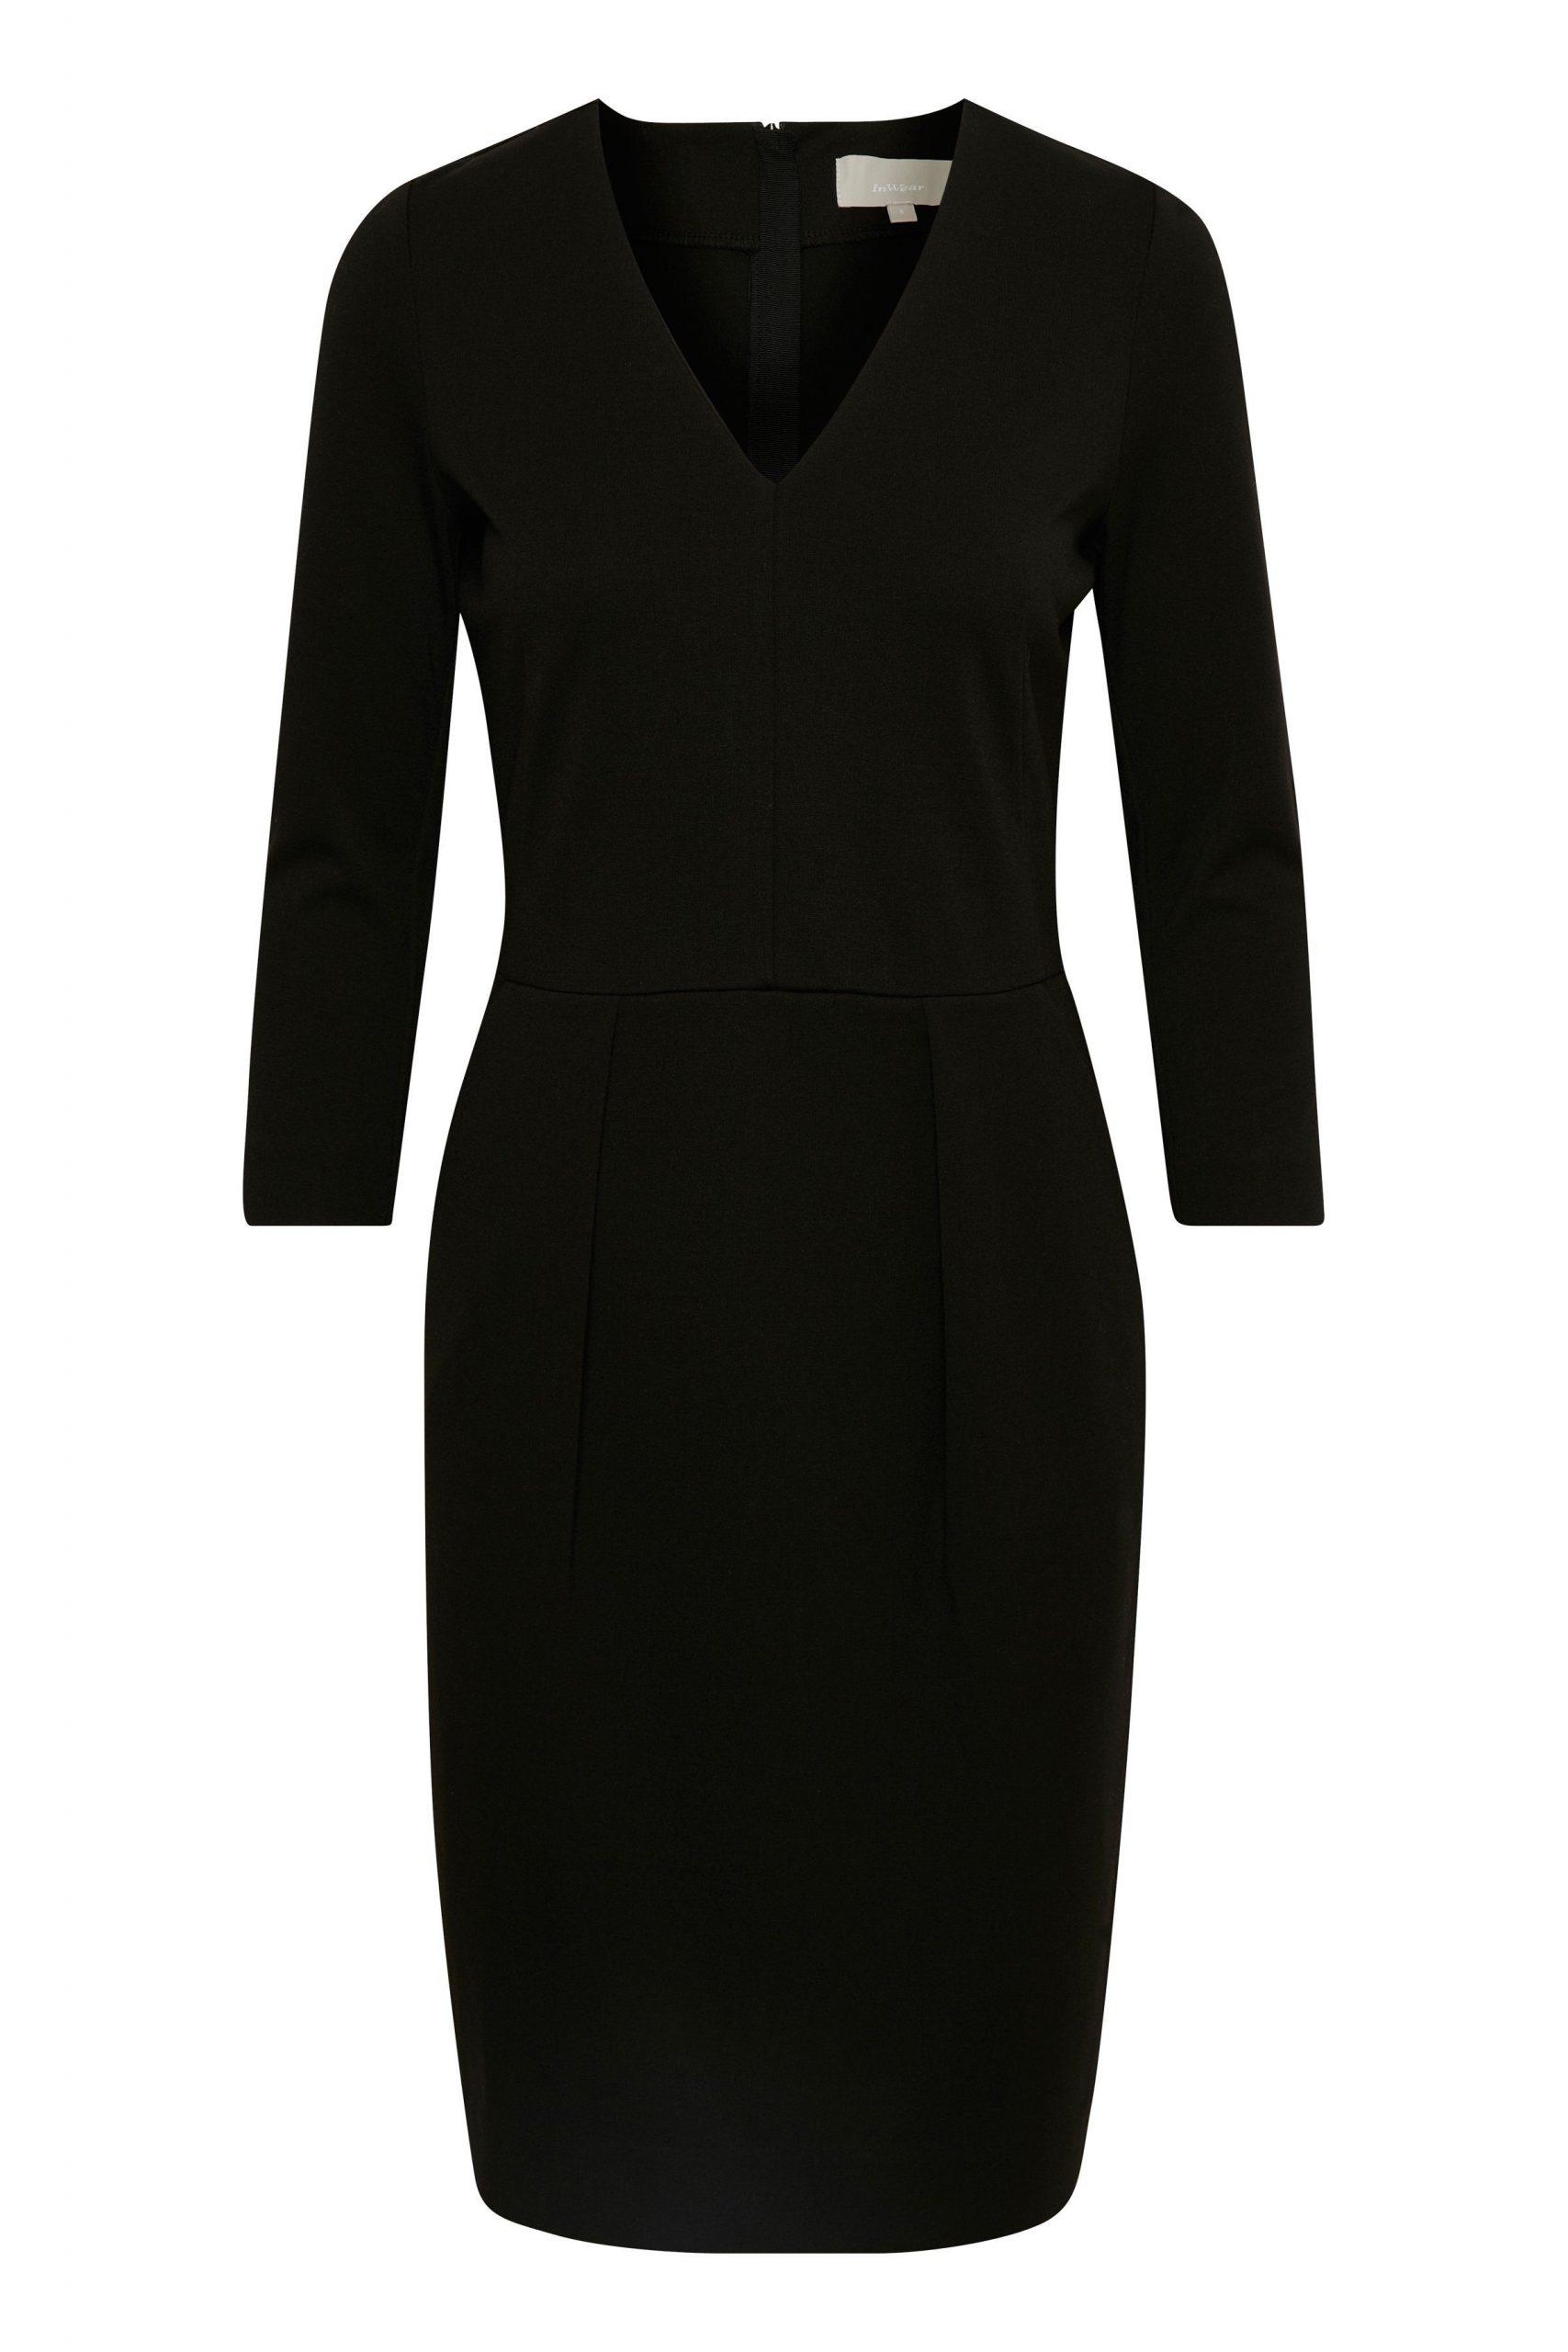 Erstaunlich Abendkleid Xs Lang Vertrieb17 Coolste Abendkleid Xs Lang Galerie